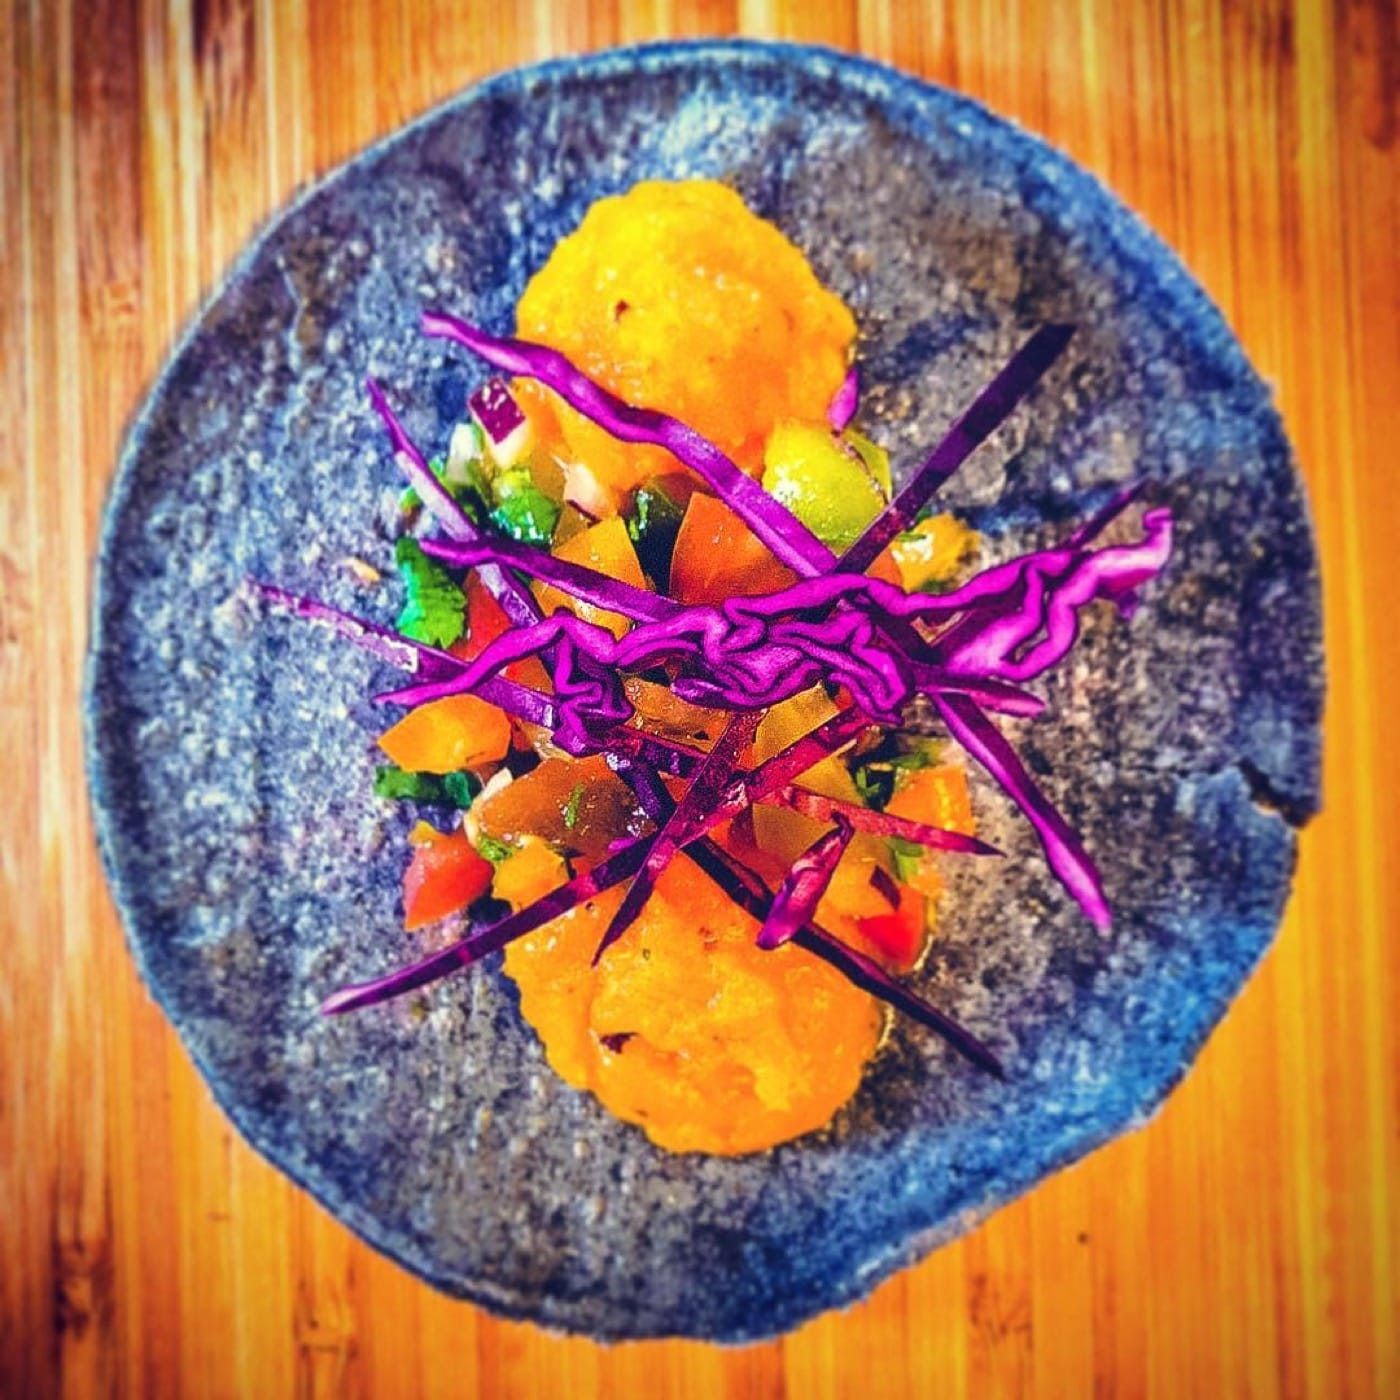 Teds Tacos - Vegan/Vegetarian